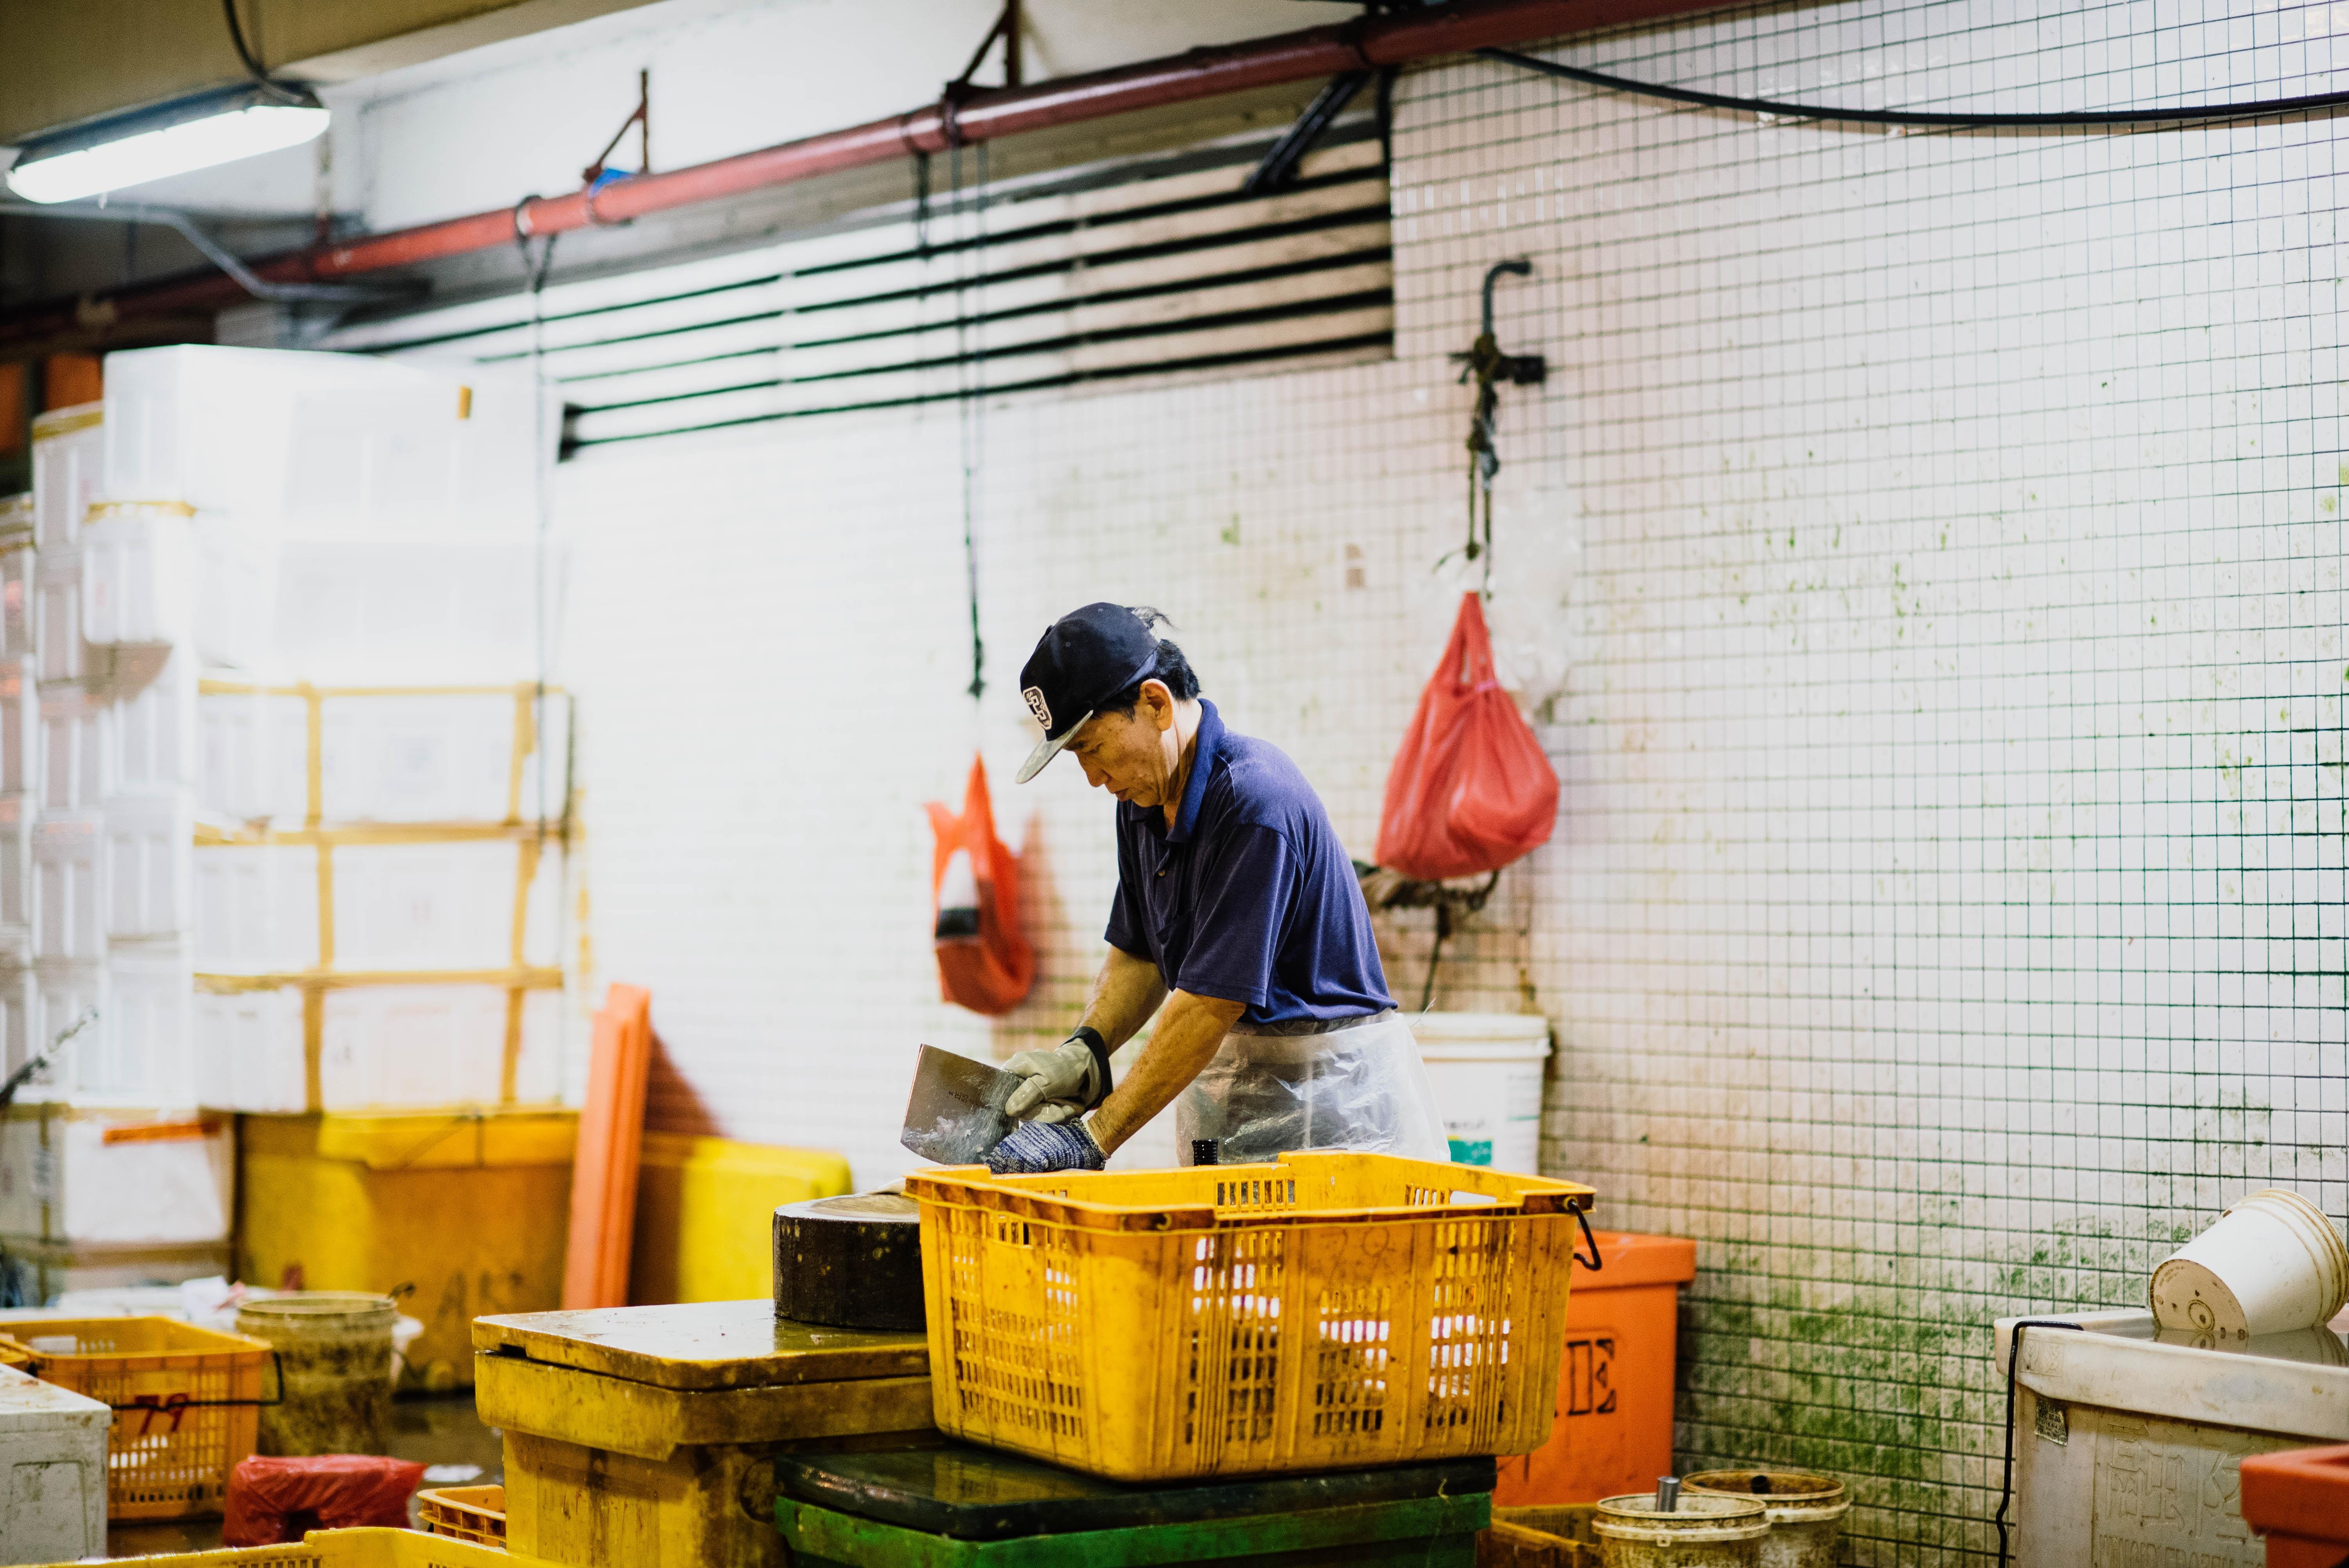 A man in a baseball cap chops fish in a processing facility